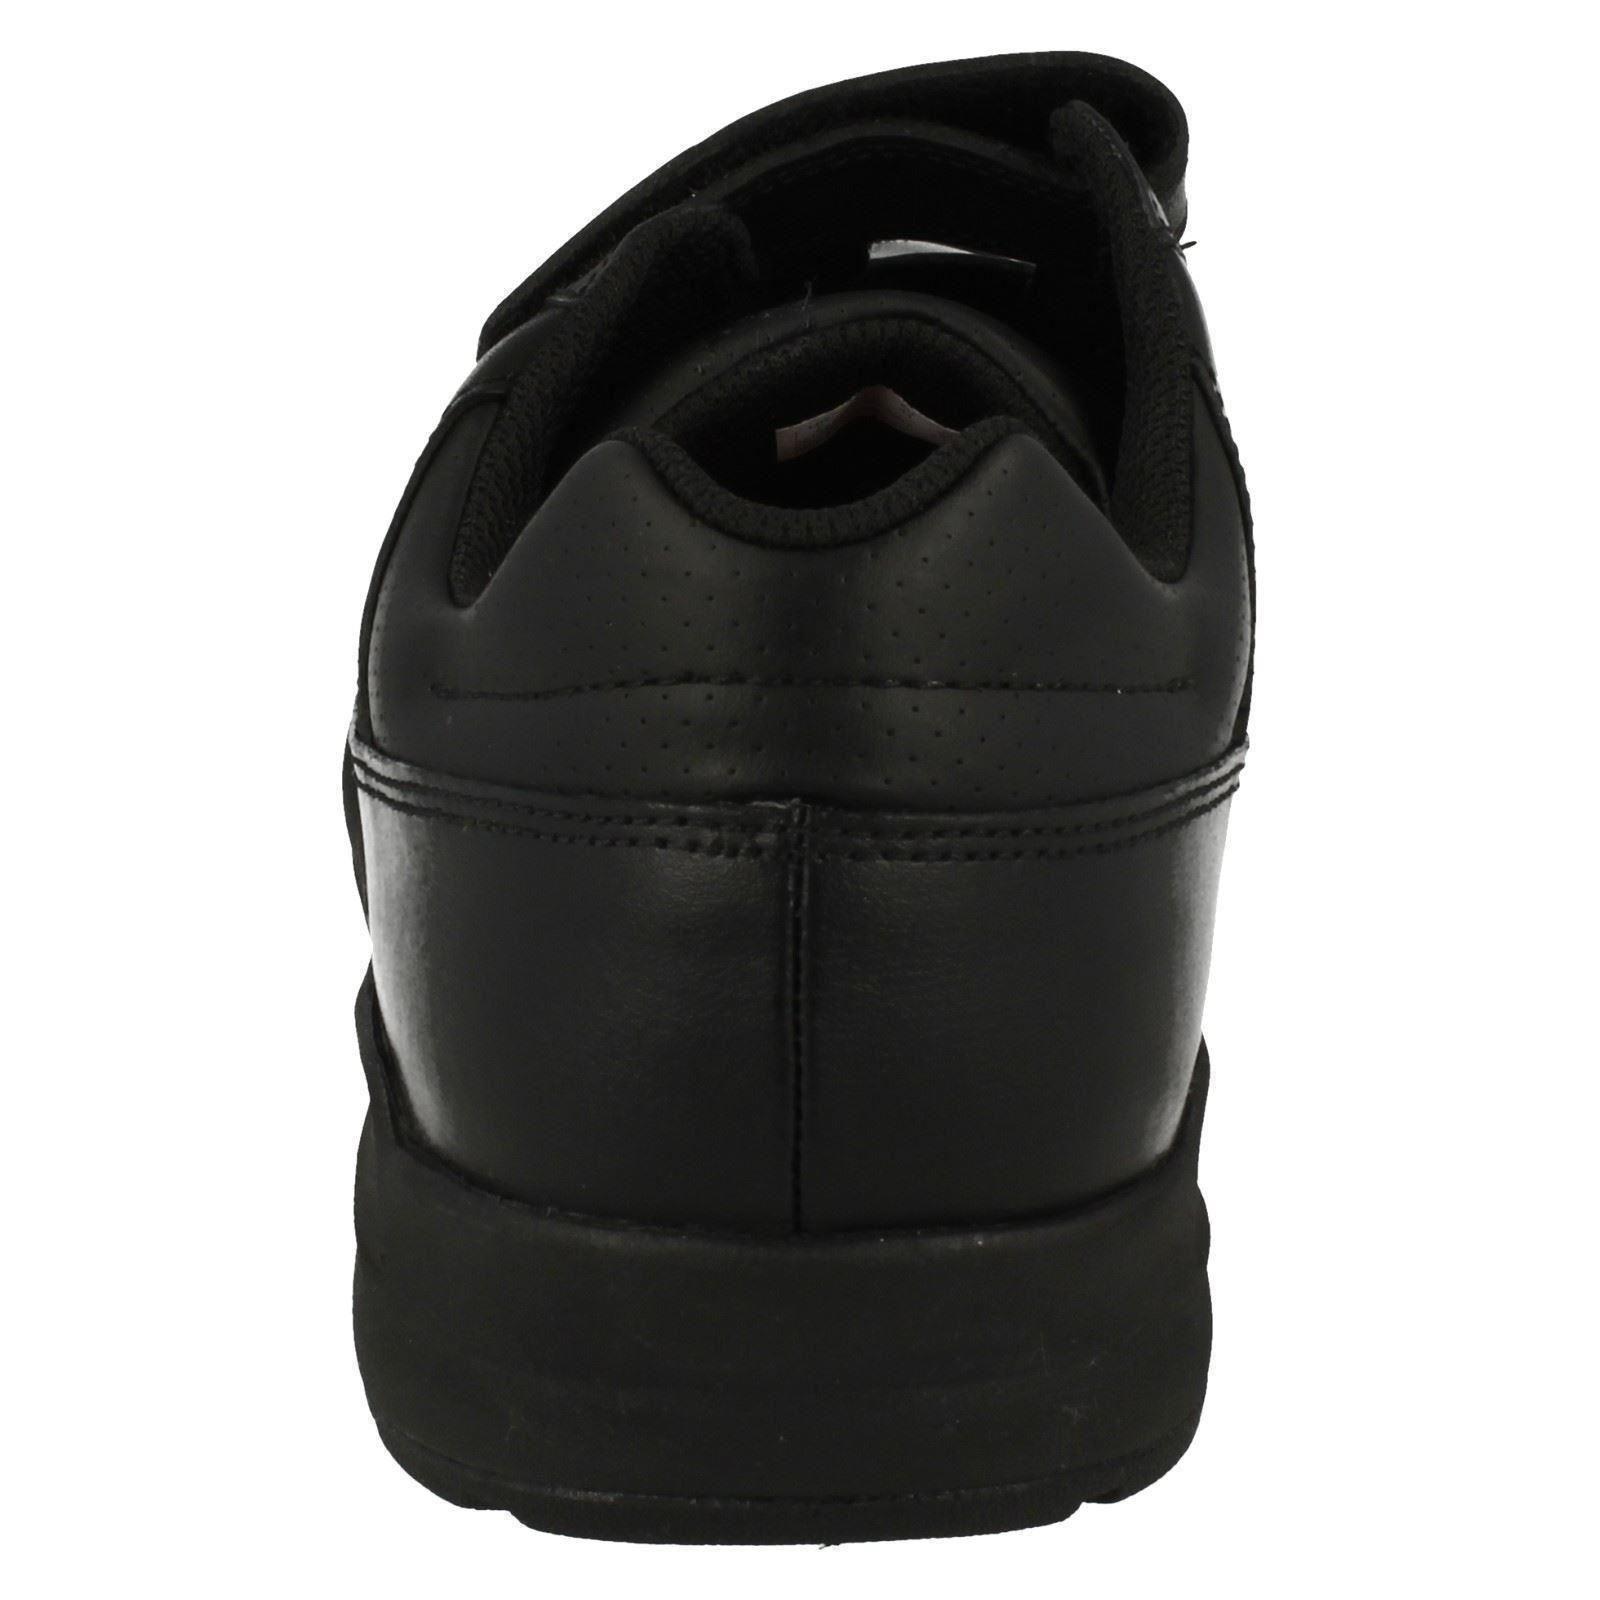 Lite Zapatos School Bootleg Monte Black Clarks By escolares RgR1wB